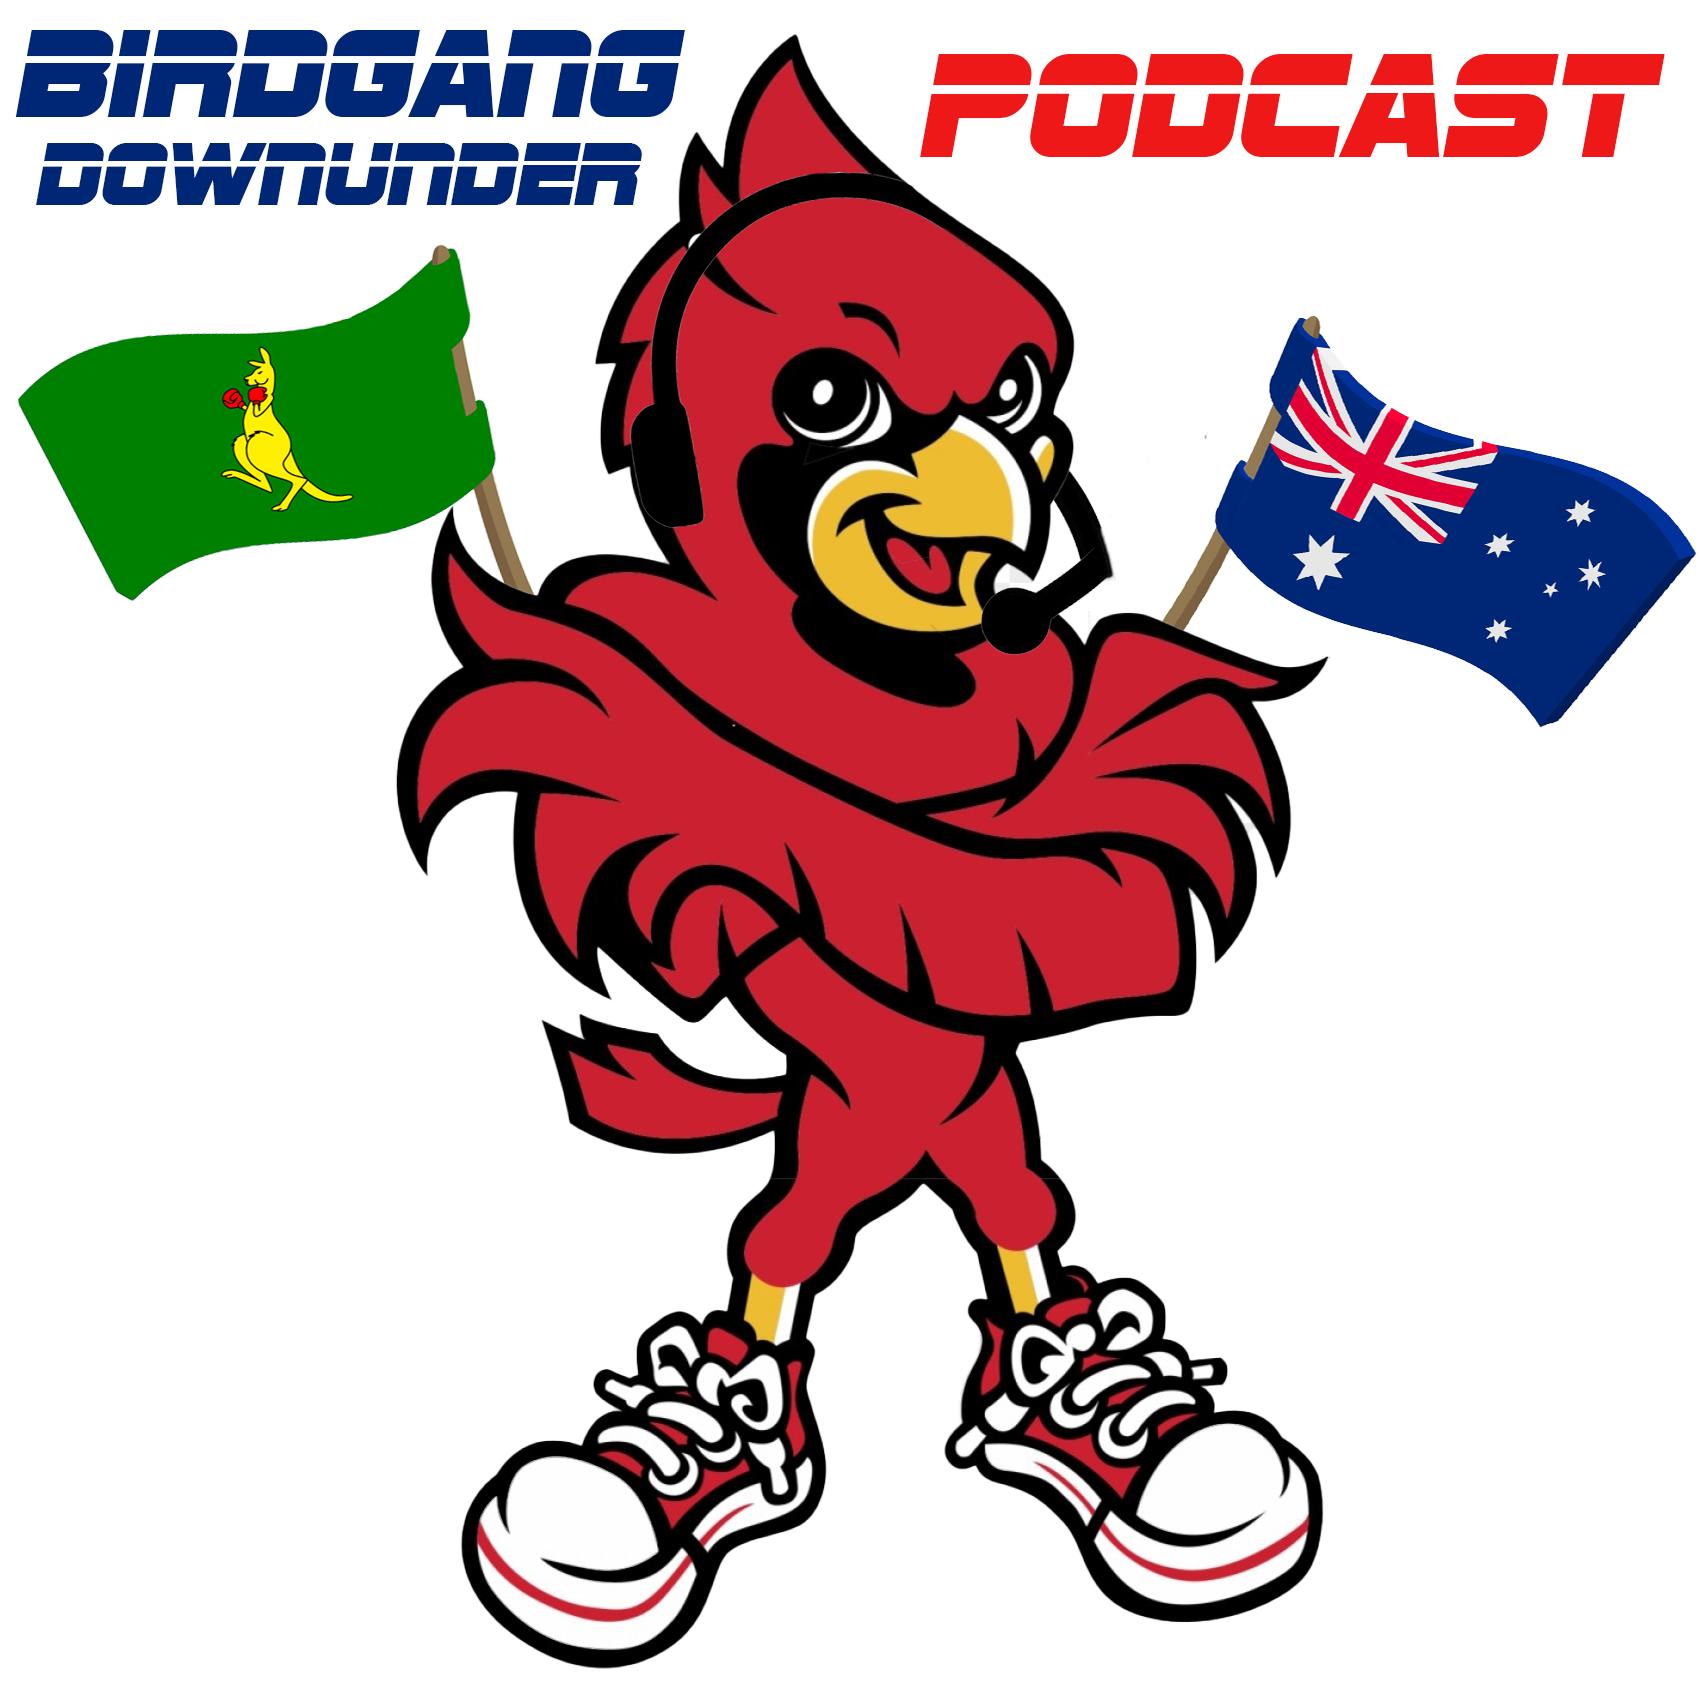 Birdgang Downunder Podcast